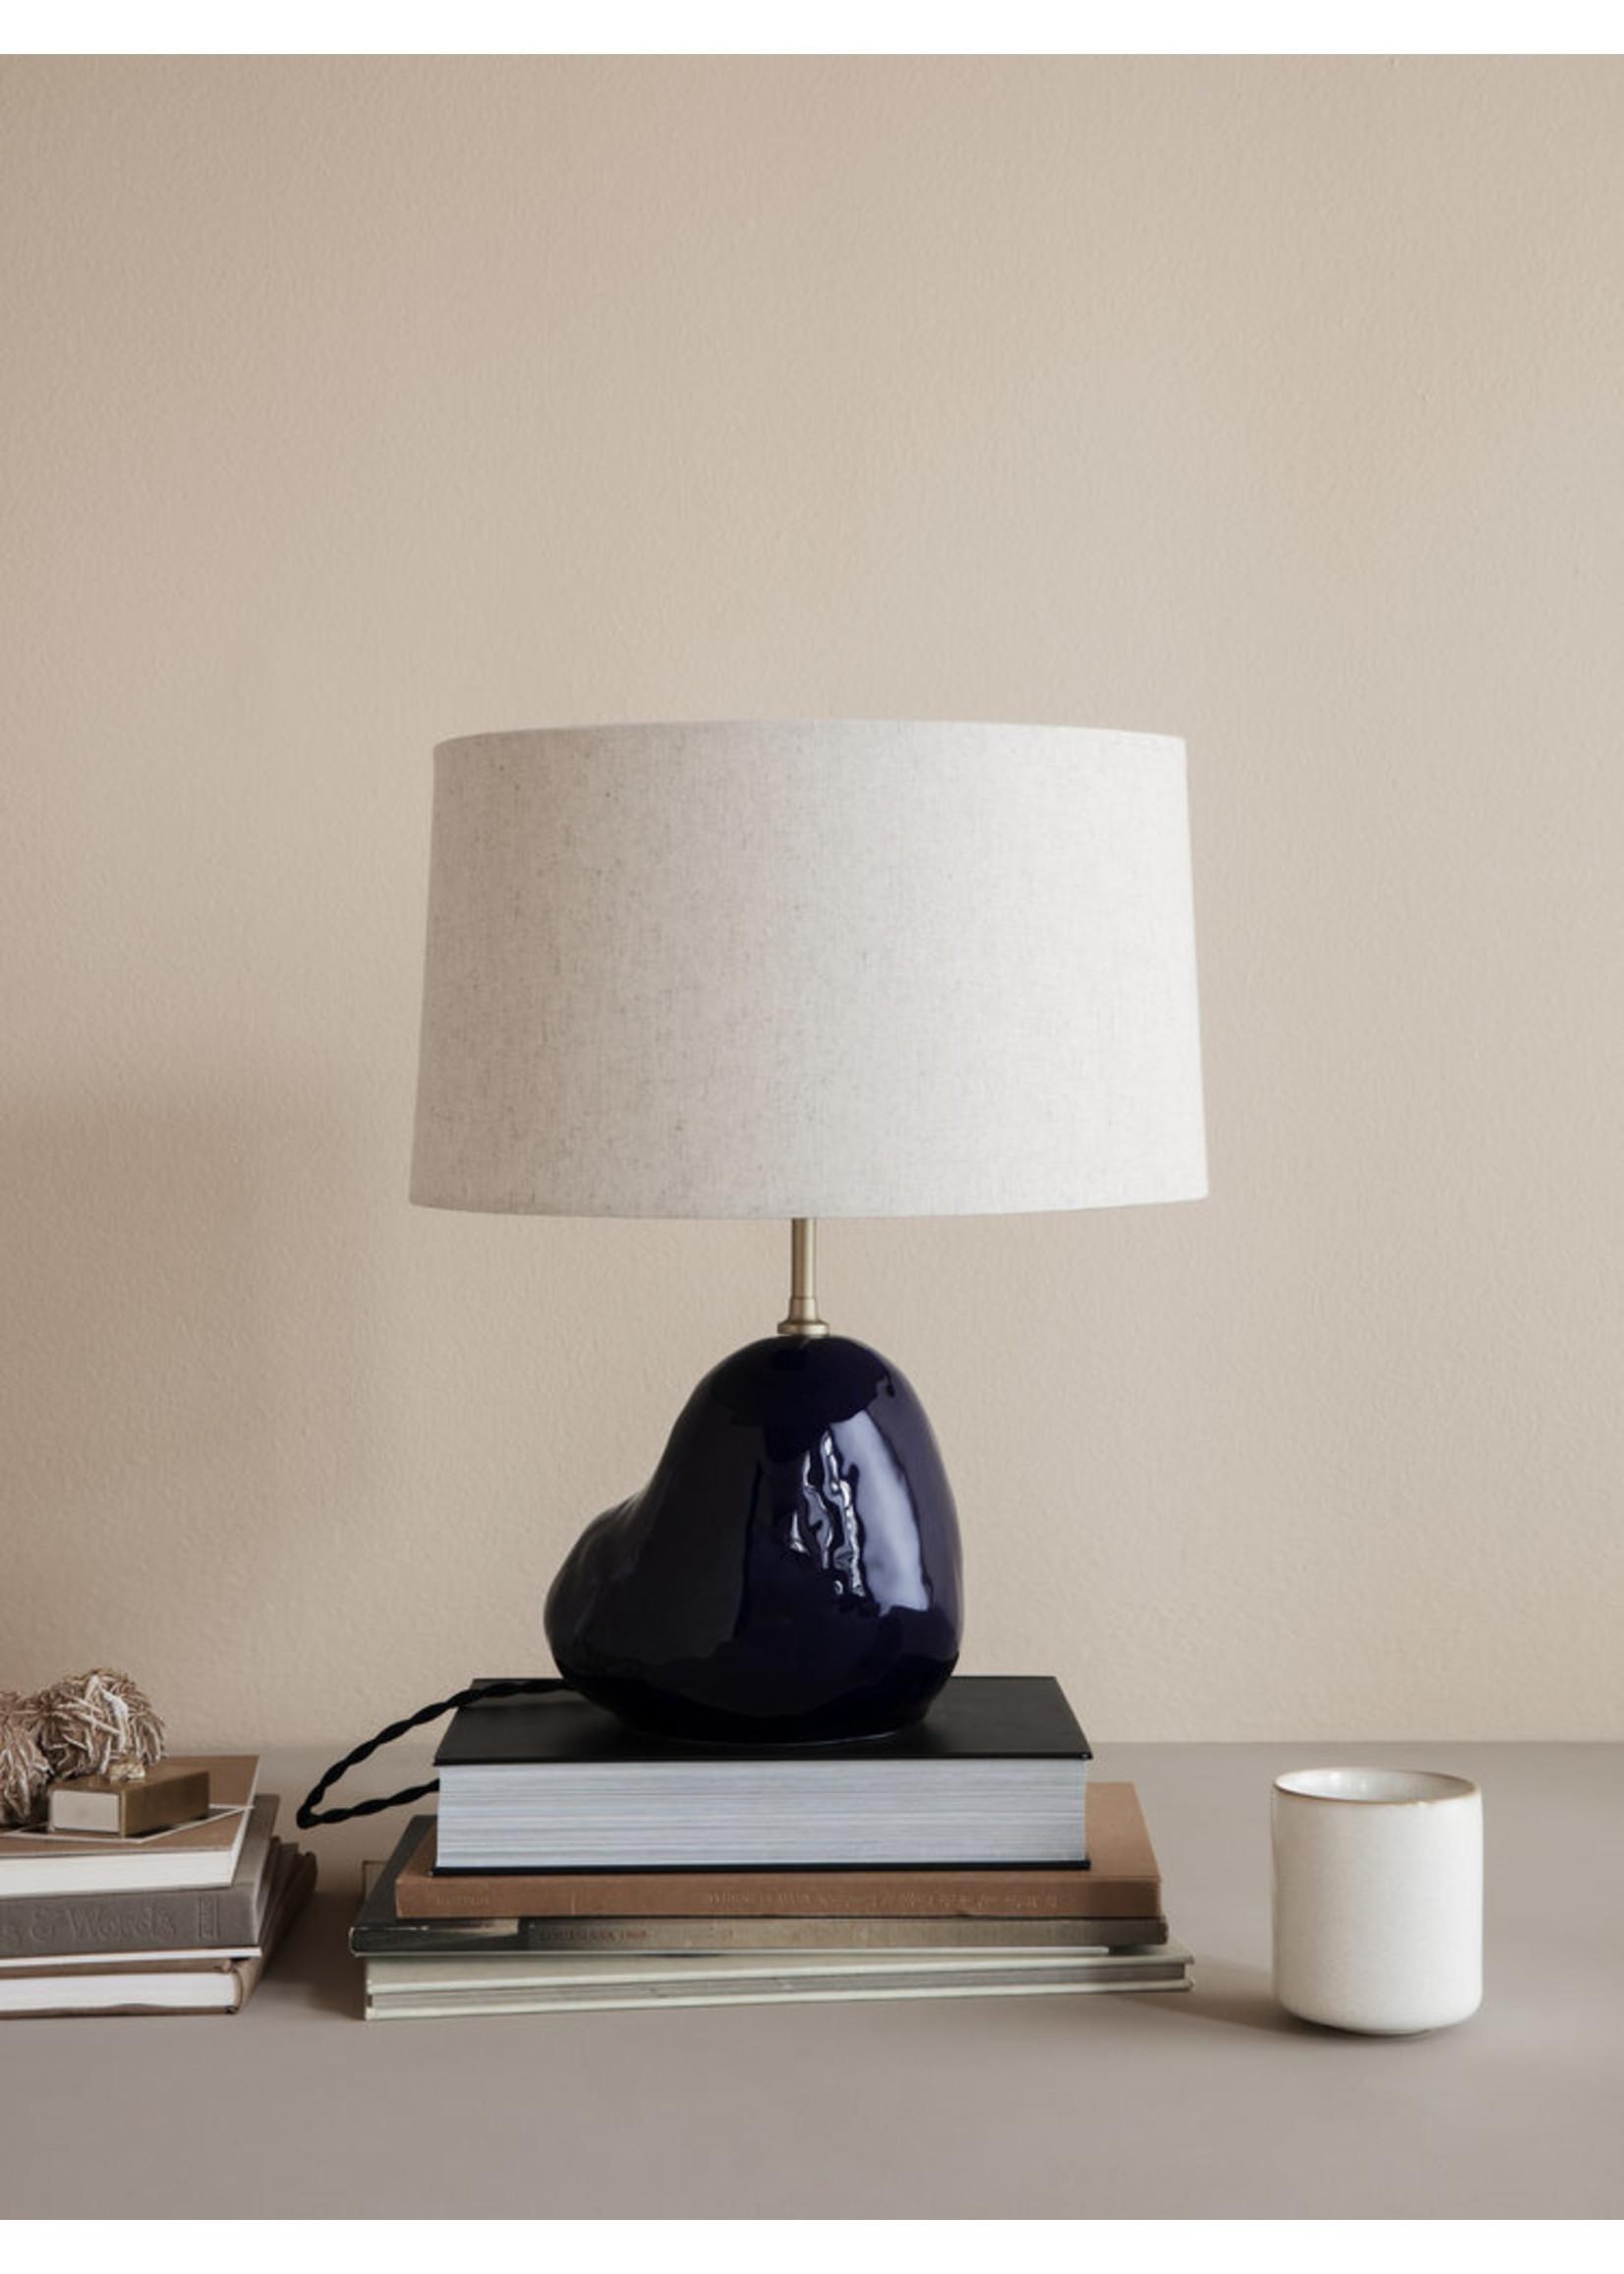 ferm LIVING Ferm Living Hebe Lamp Base - Small